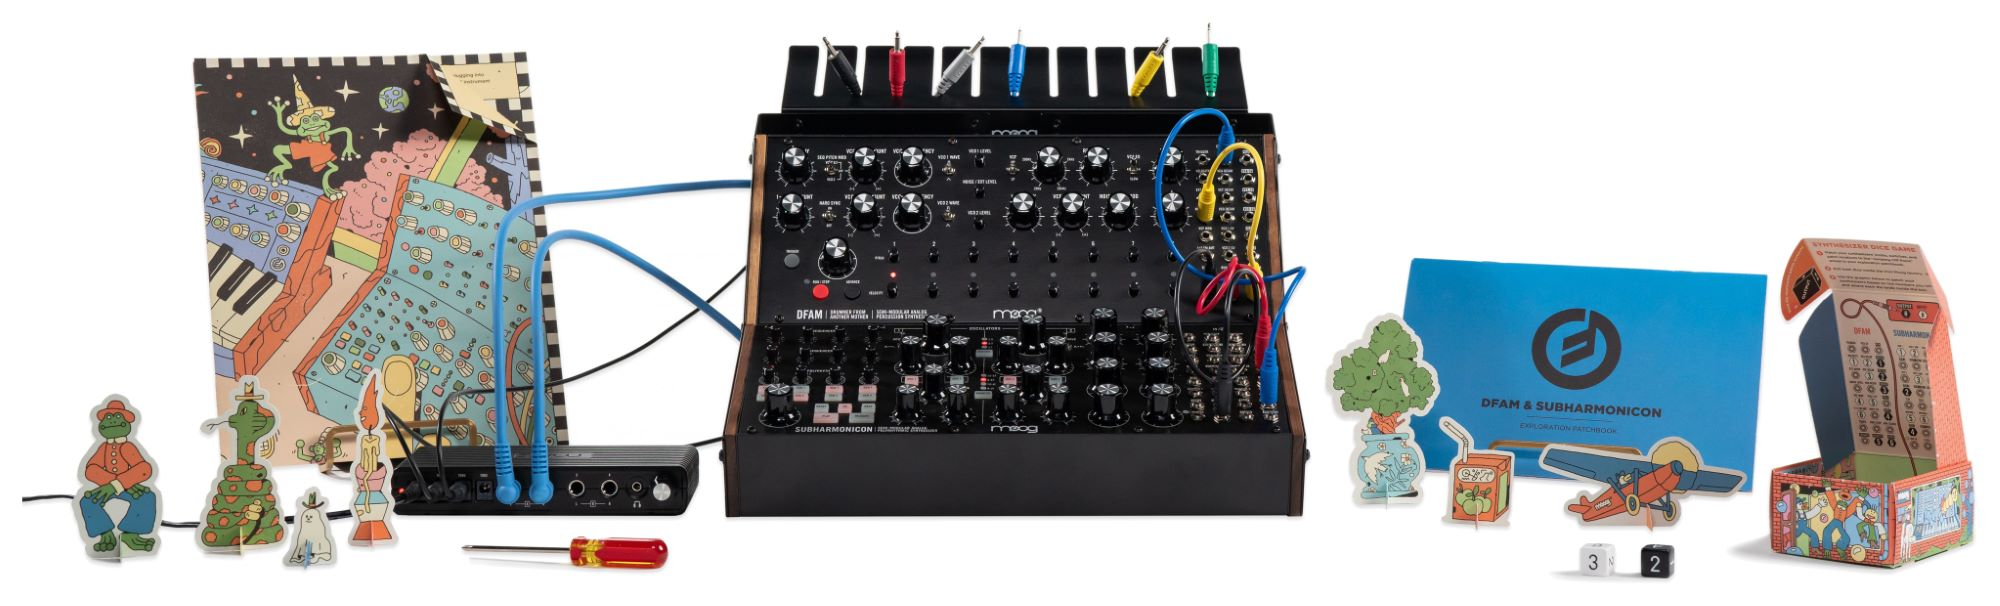 Synthesizer - Moog Sound Studio DFAM Subharmonicon - Onlineshop Musikhaus Kirstein